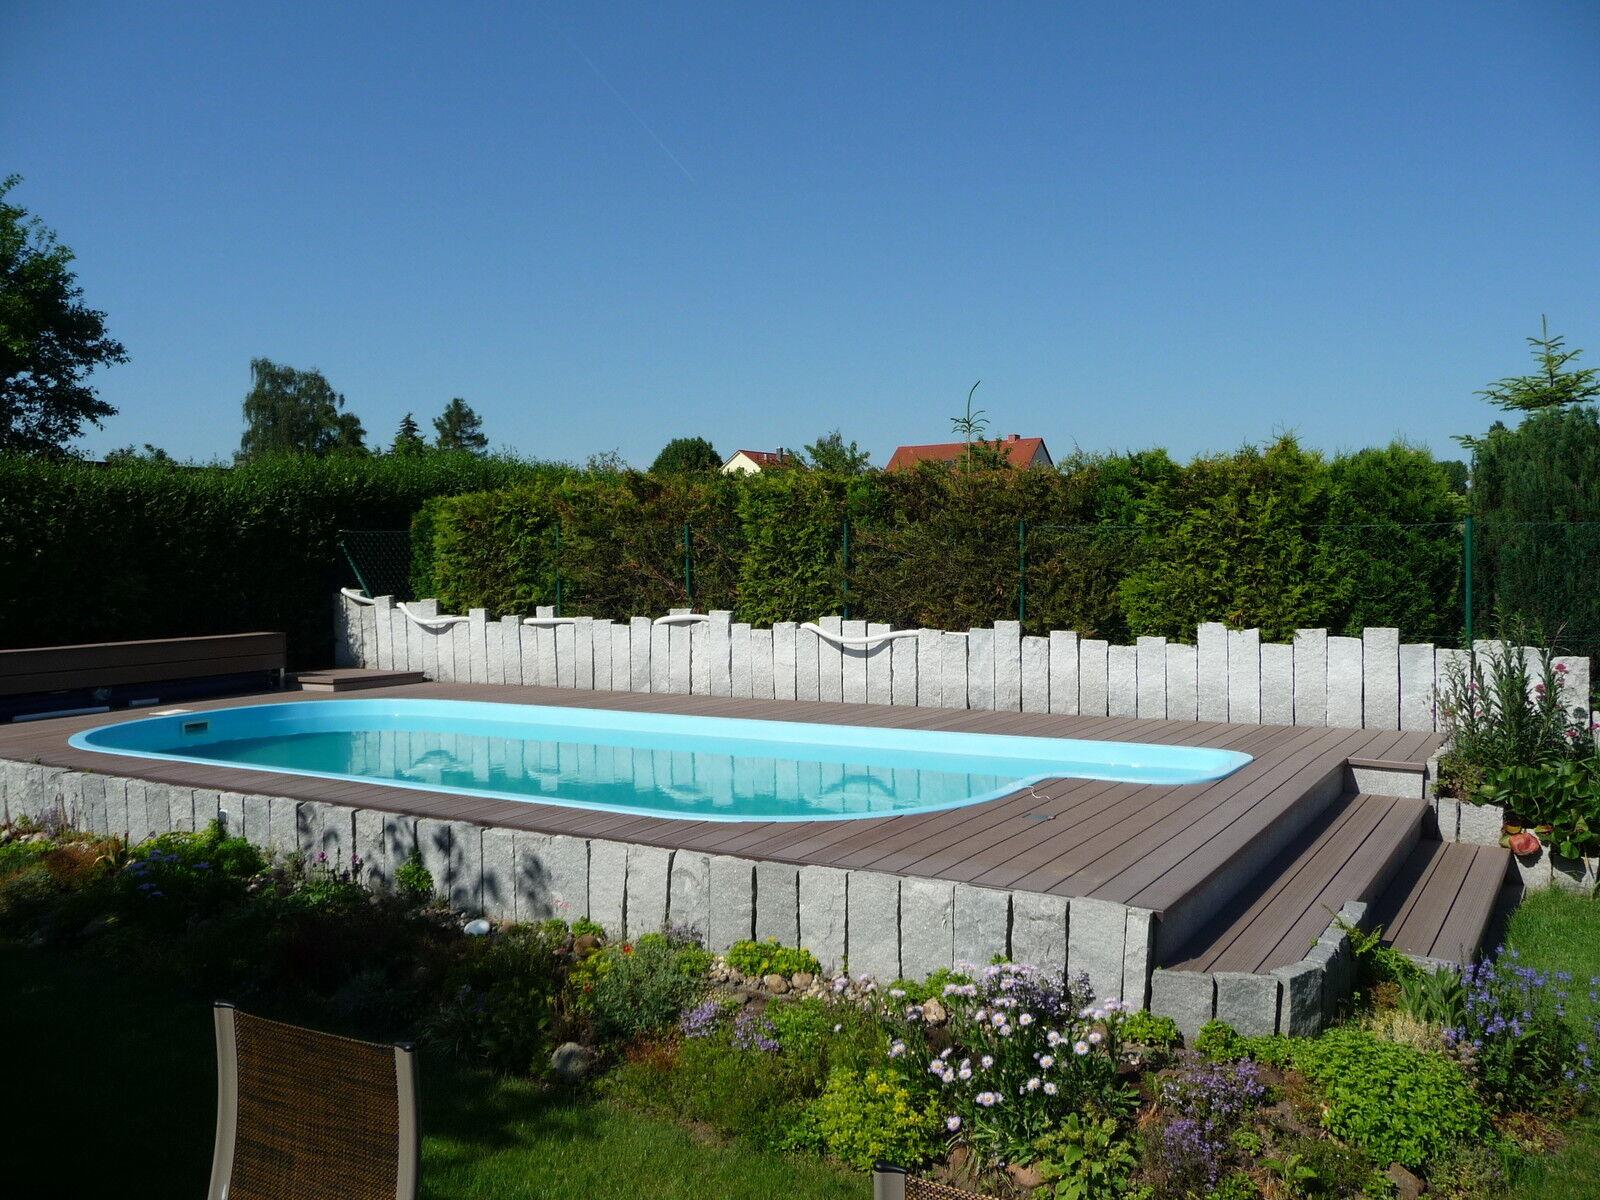 wpc terrassen dielen diele pool holz poolumrandung pool. Black Bedroom Furniture Sets. Home Design Ideas